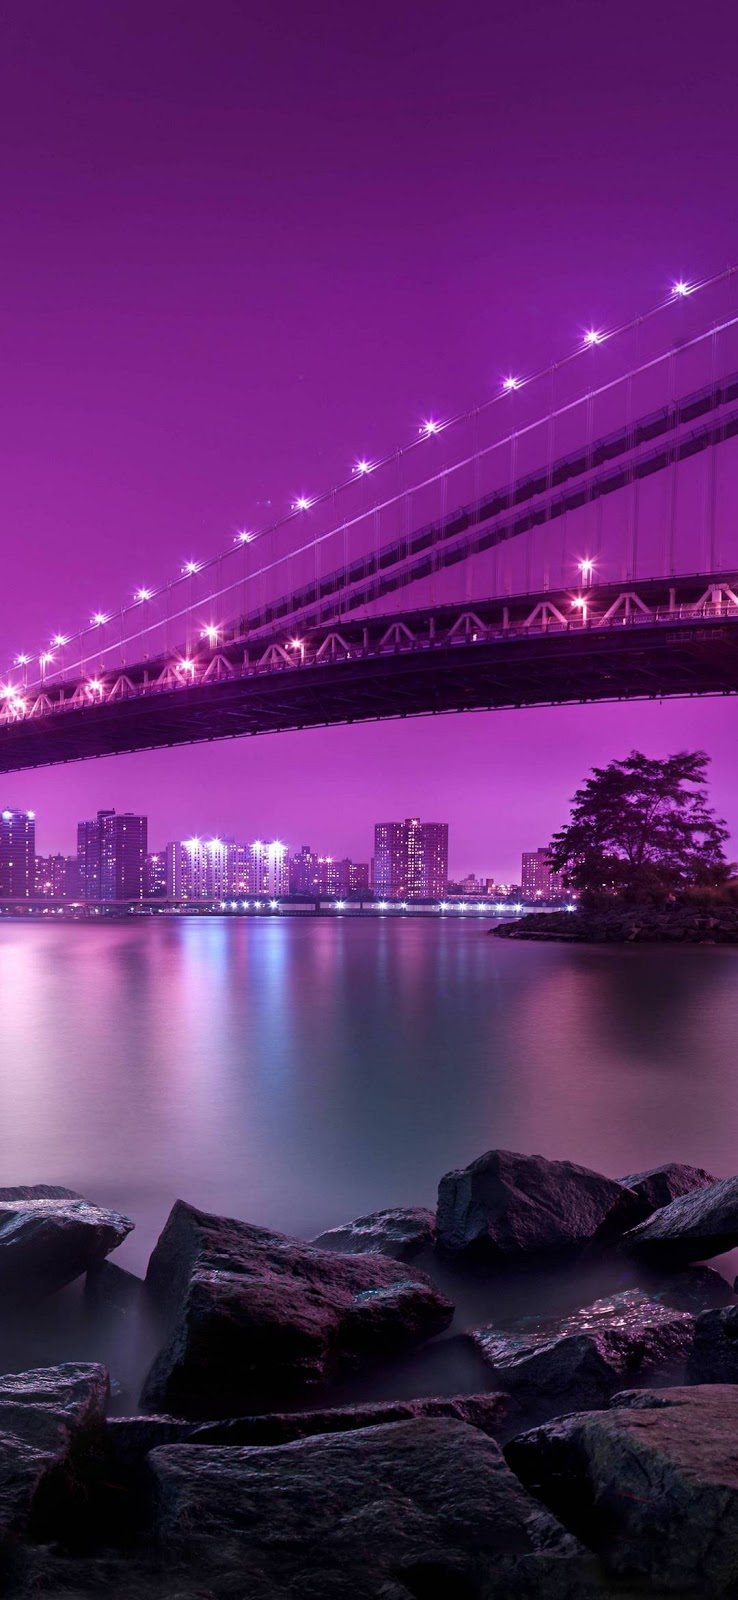 The purple lake